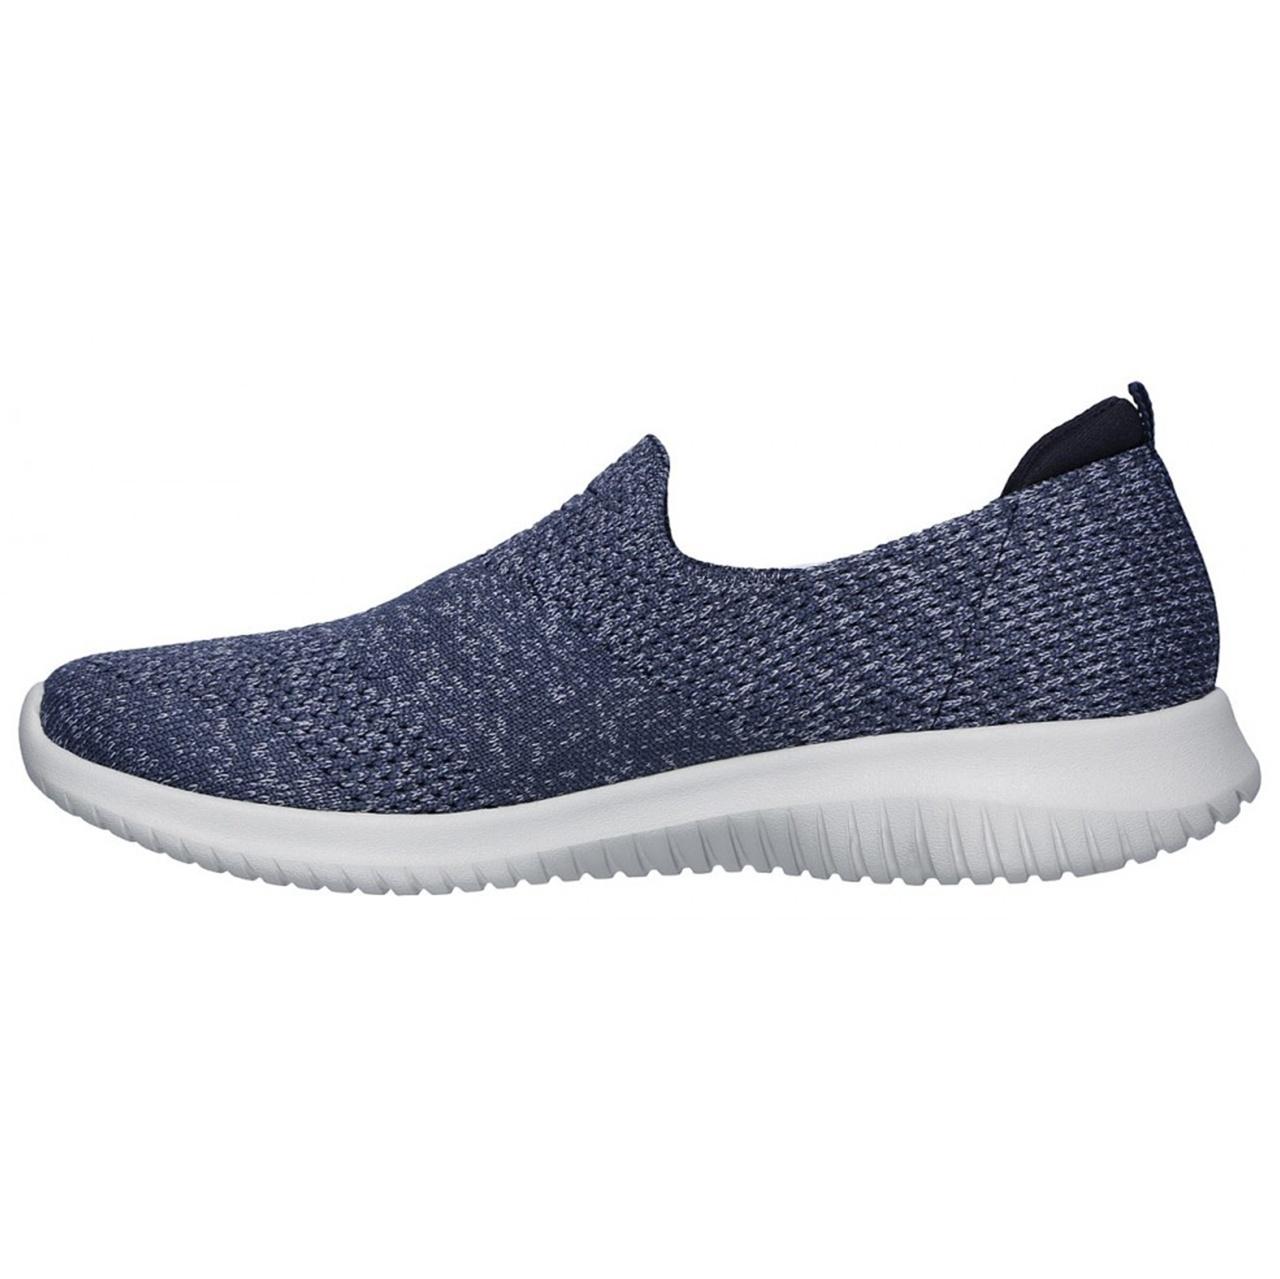 کفش مخصوص پیاده روی زنانه اسکچرز مدل MIRACLE 13106 NVY